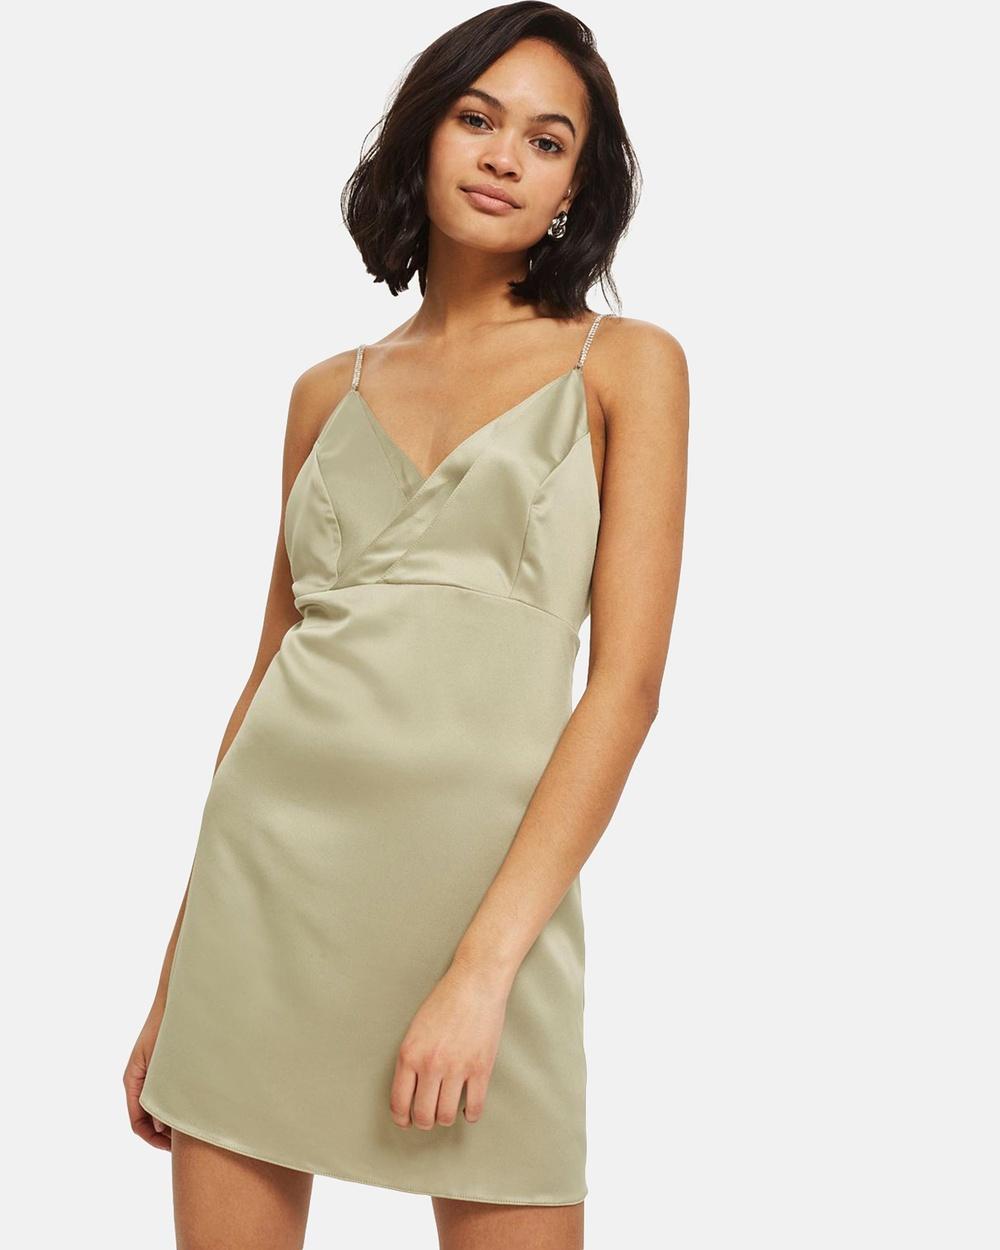 TOPSHOP Diamante Strap Mini Slip Dress Dresses Khaki Diamante Strap Mini Slip Dress